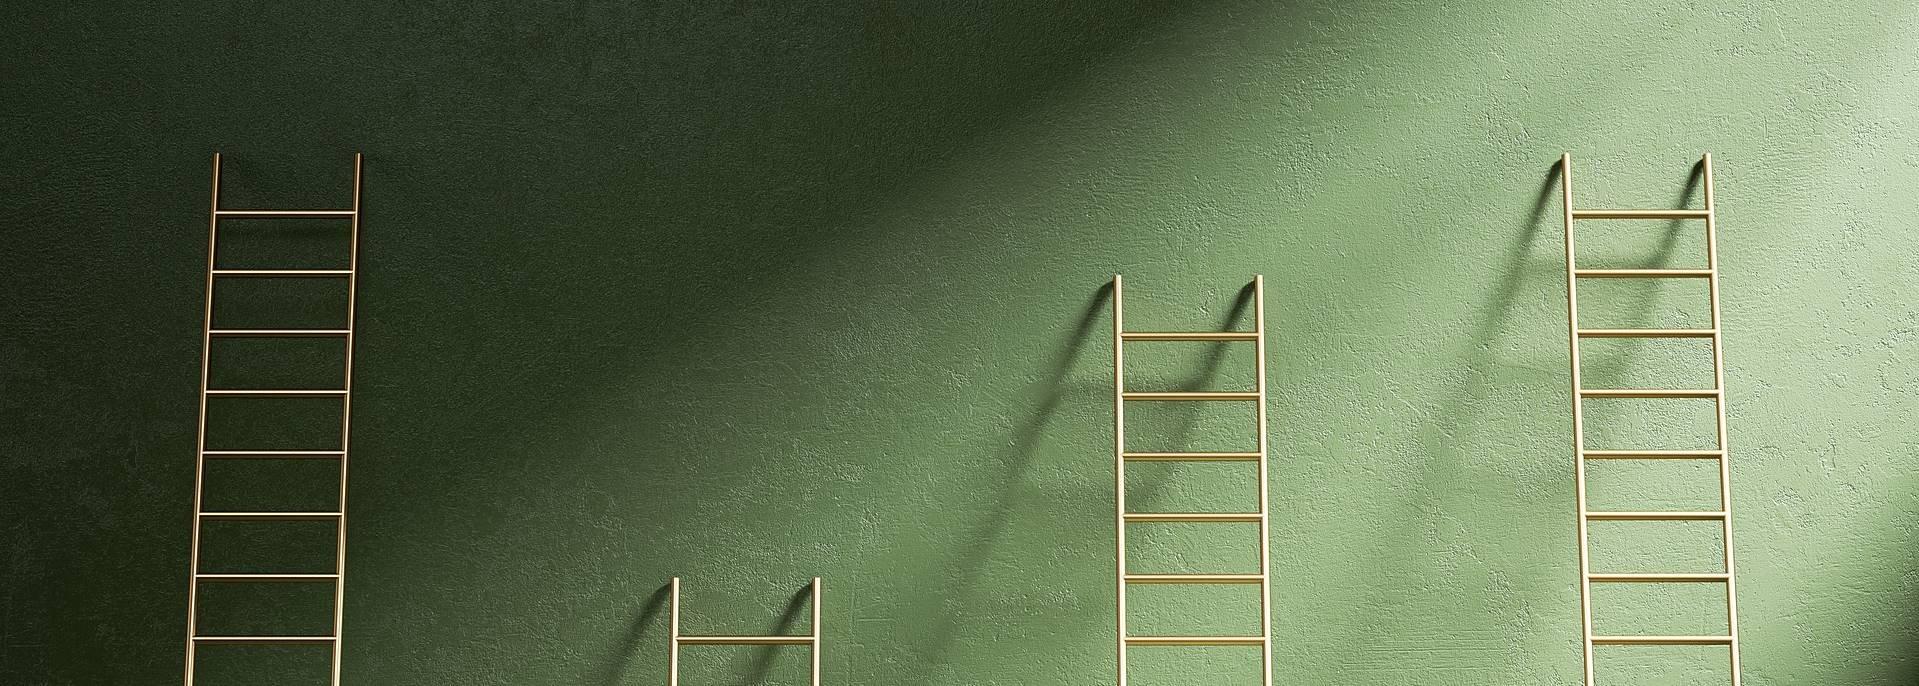 IT career advancement ladders